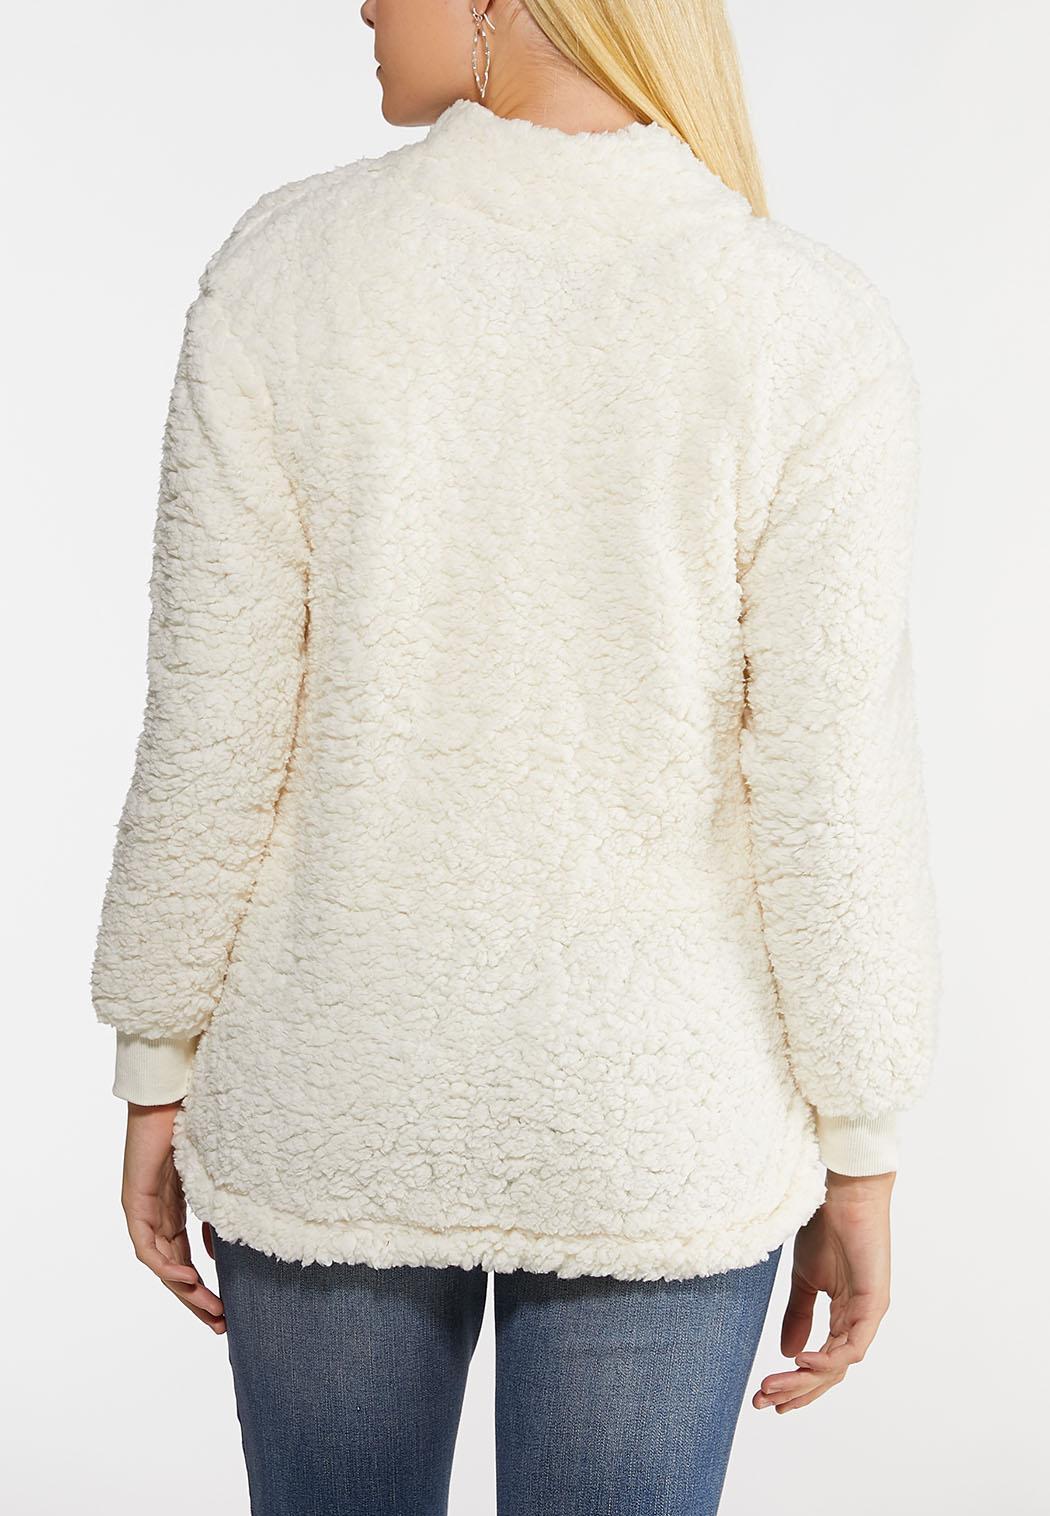 Plus Size Cozy Fleece Pullover Top (Item #44047638)